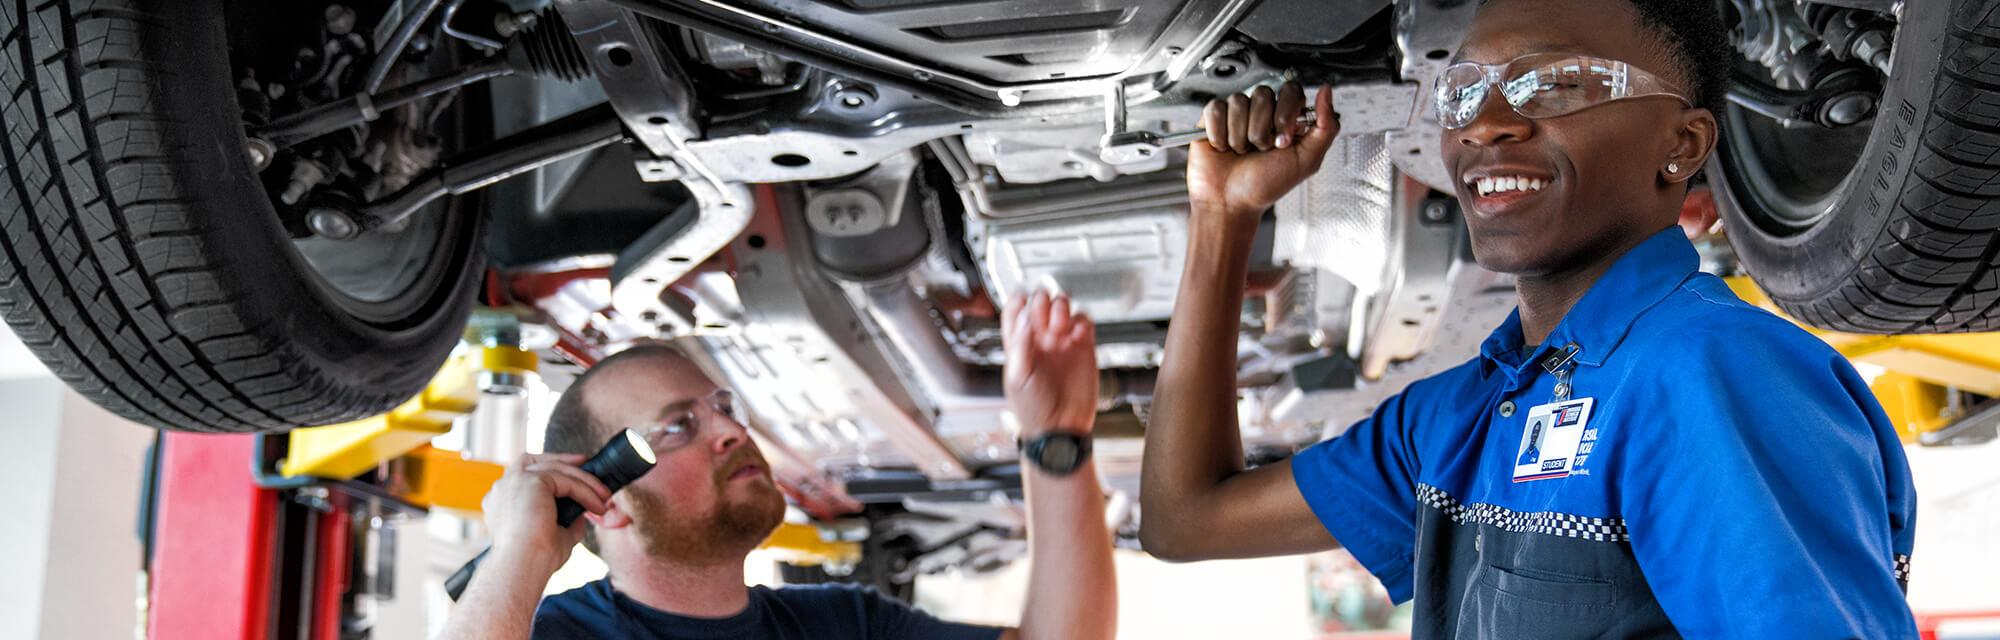 Learning Automotive Repair at High School Summer Program